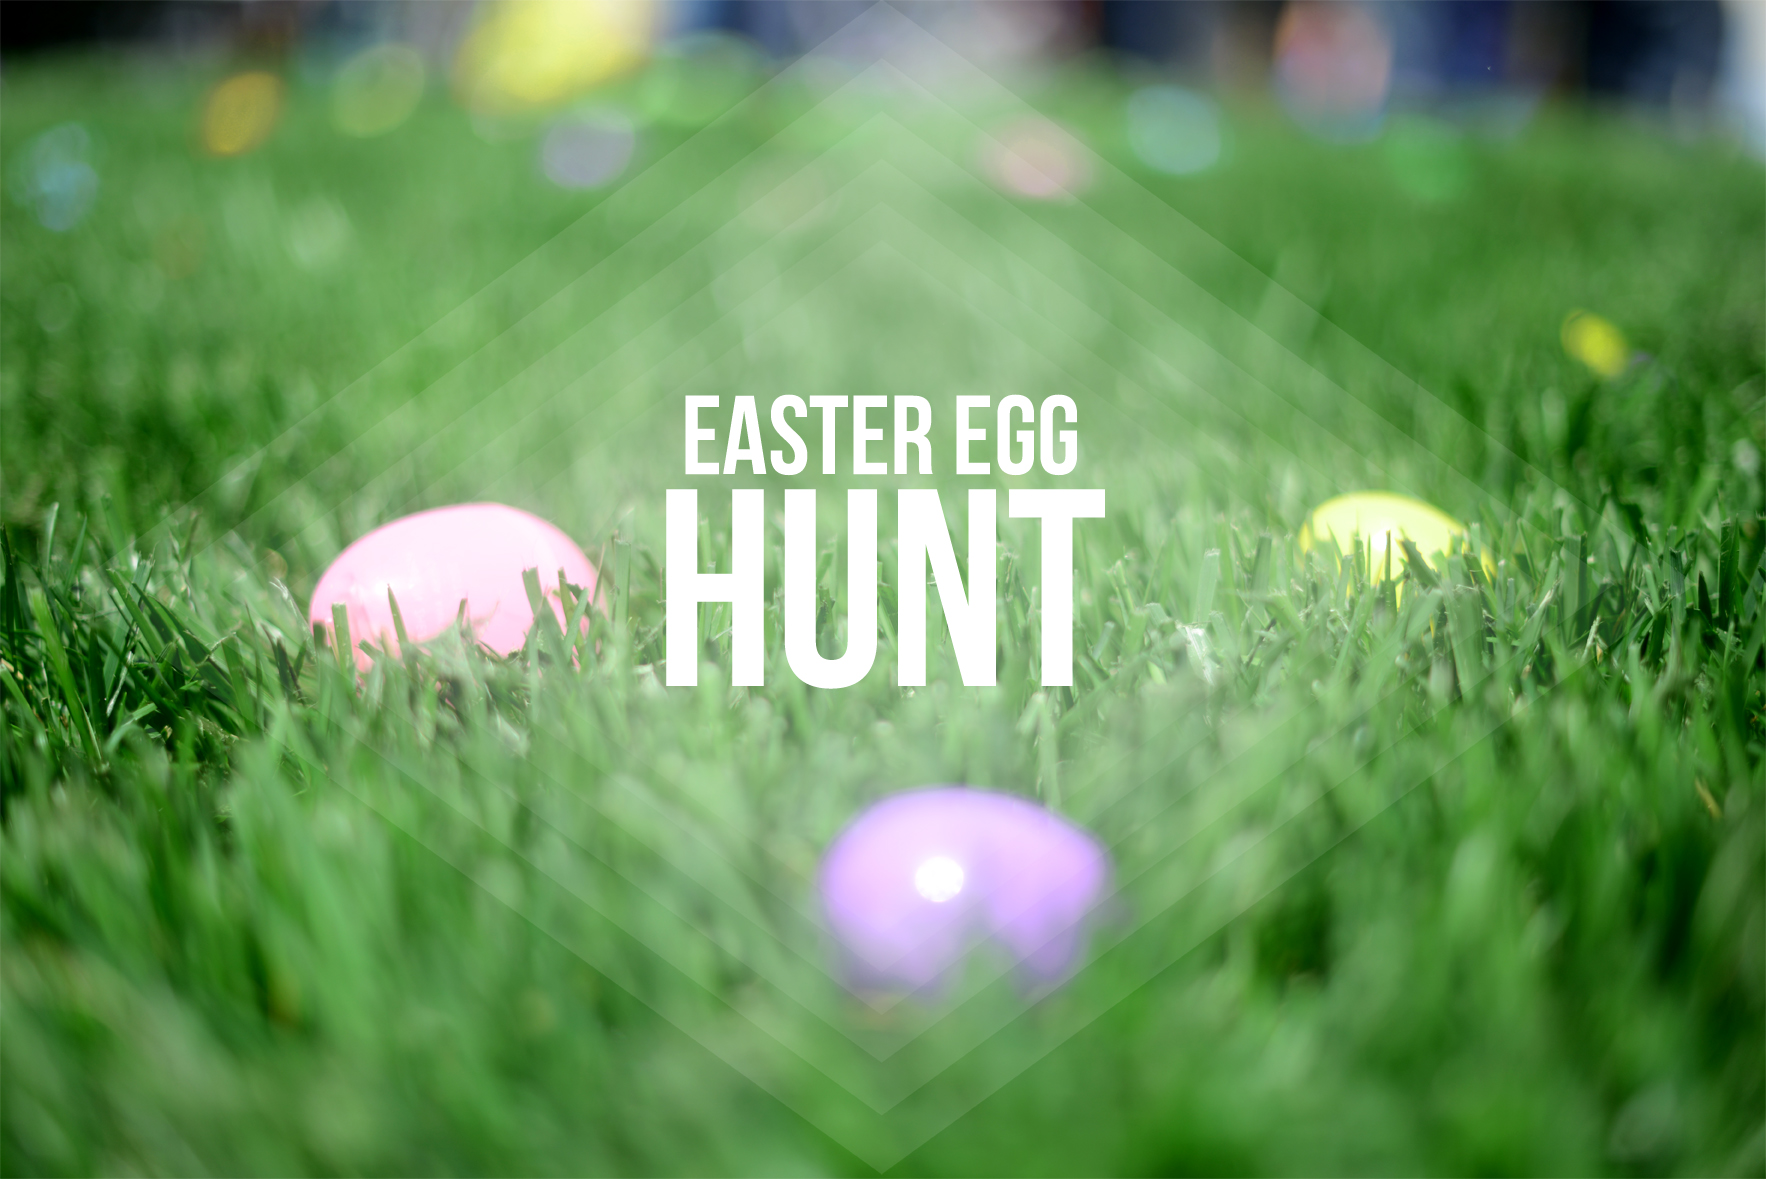 Easter_0000_Egg-hunt